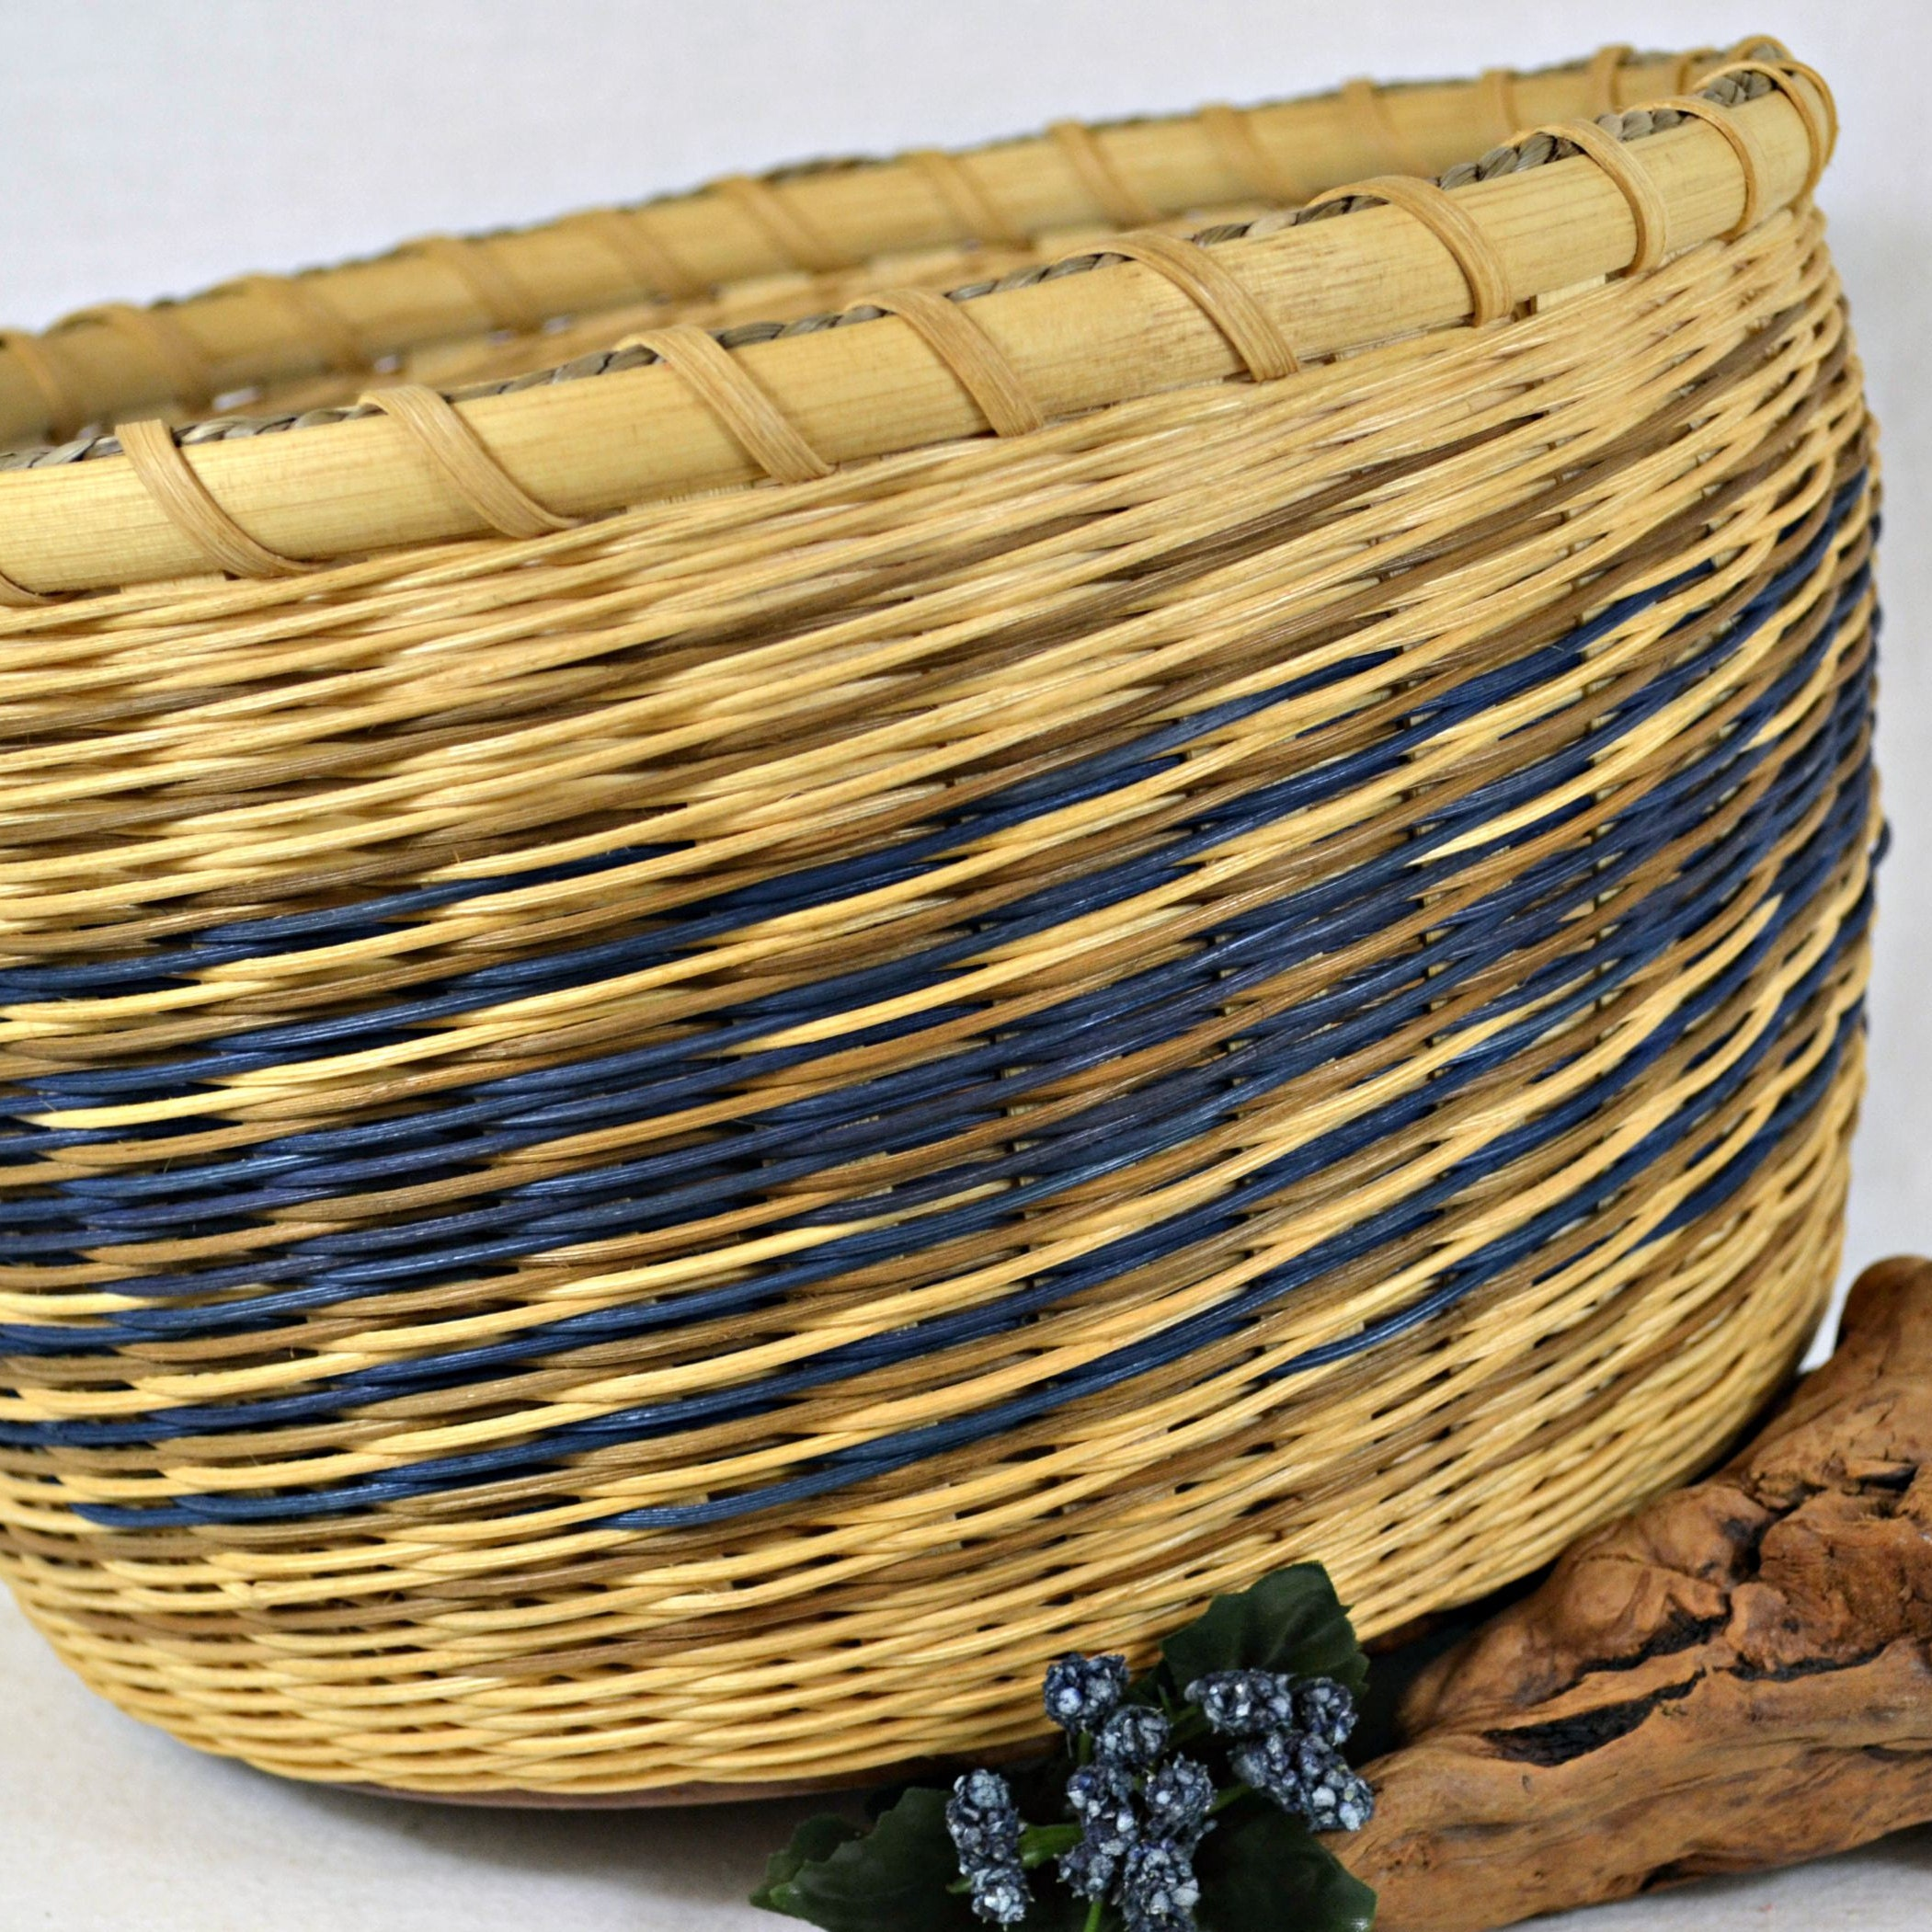 weave reed pattern - photo #16